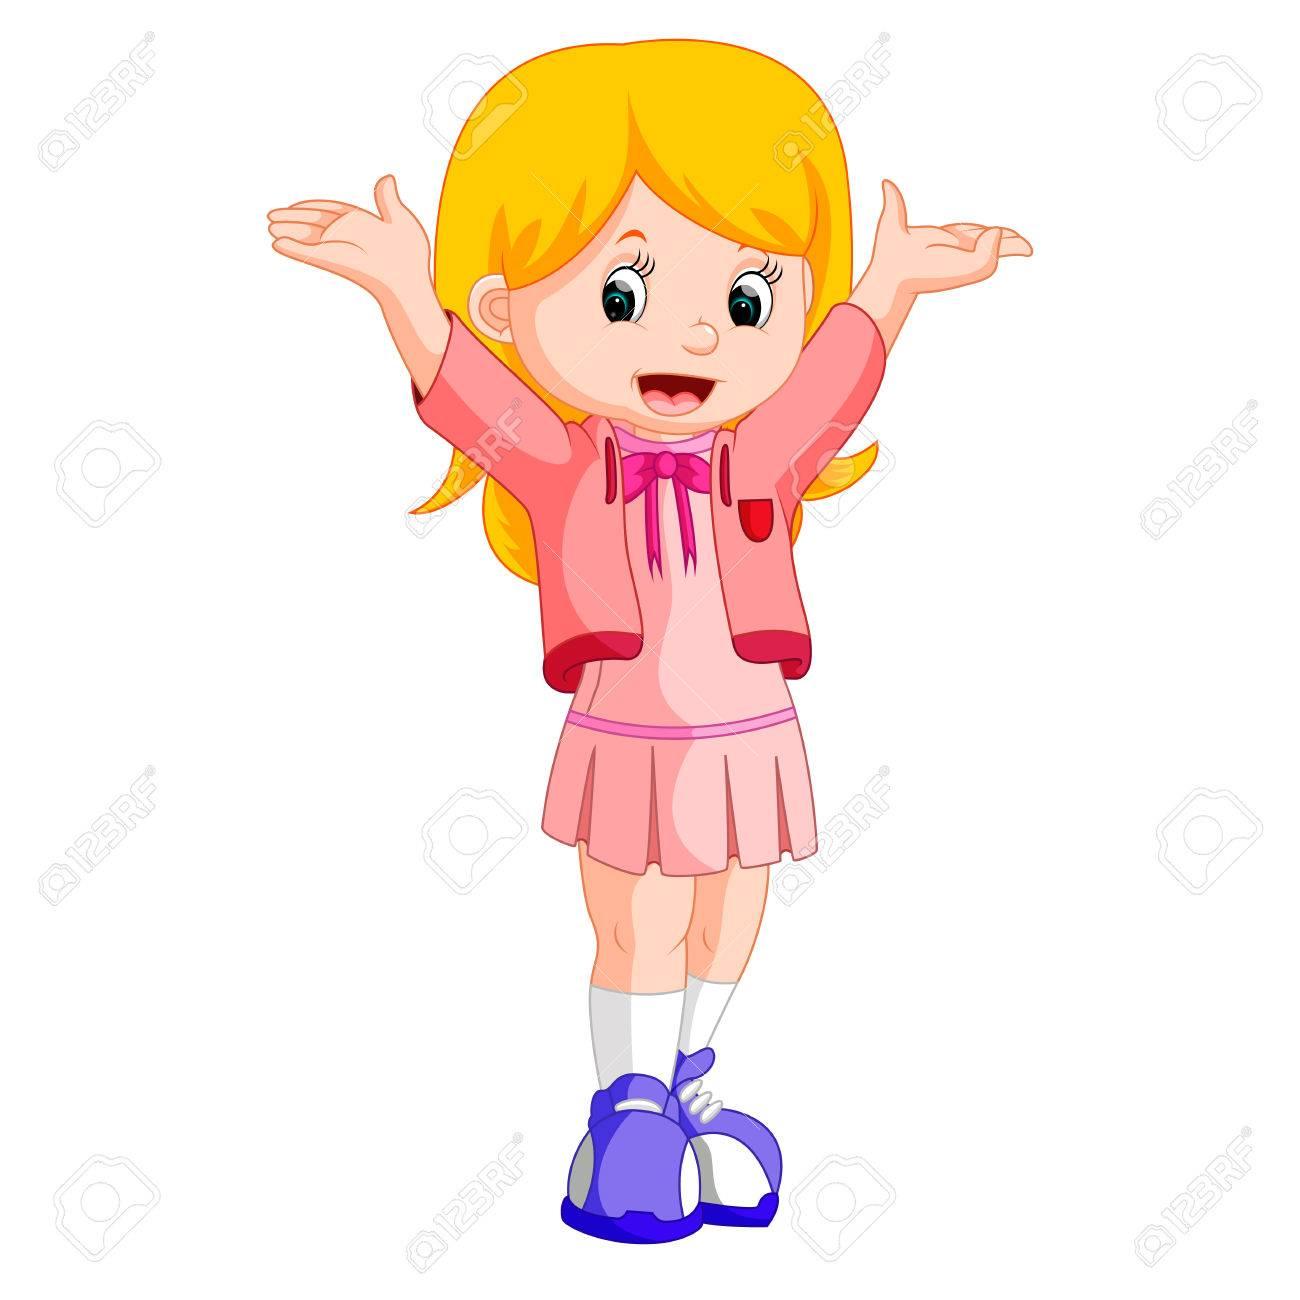 Happy little girl cartoon.